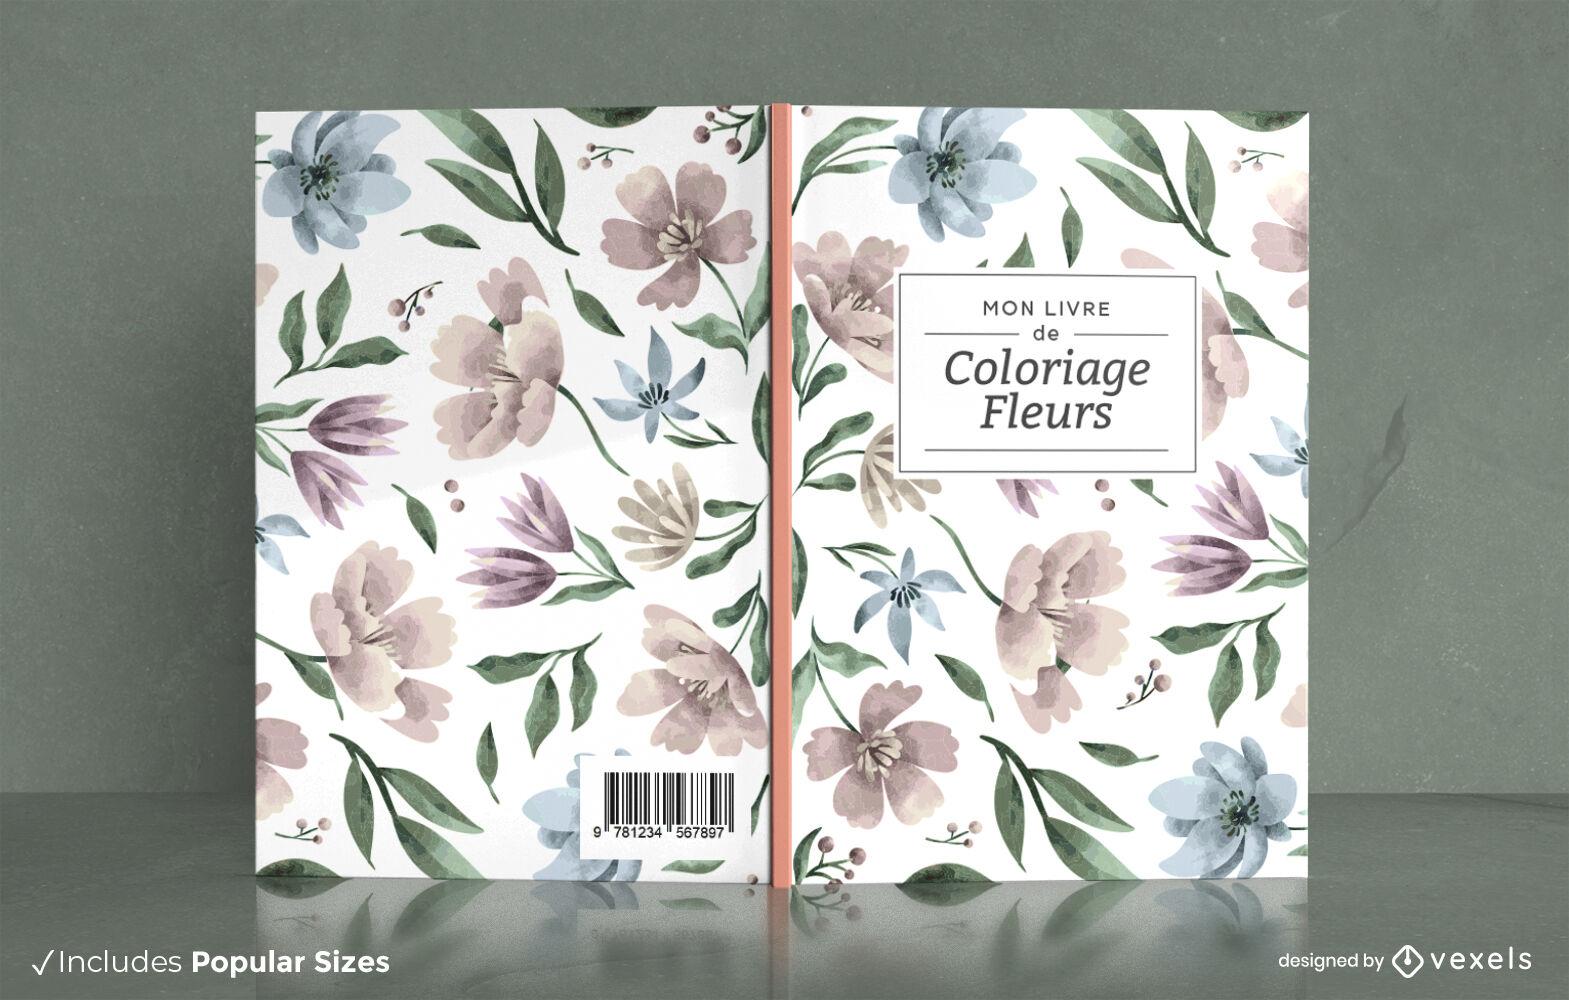 Aquarell Blätter und Blumen Cover-Design